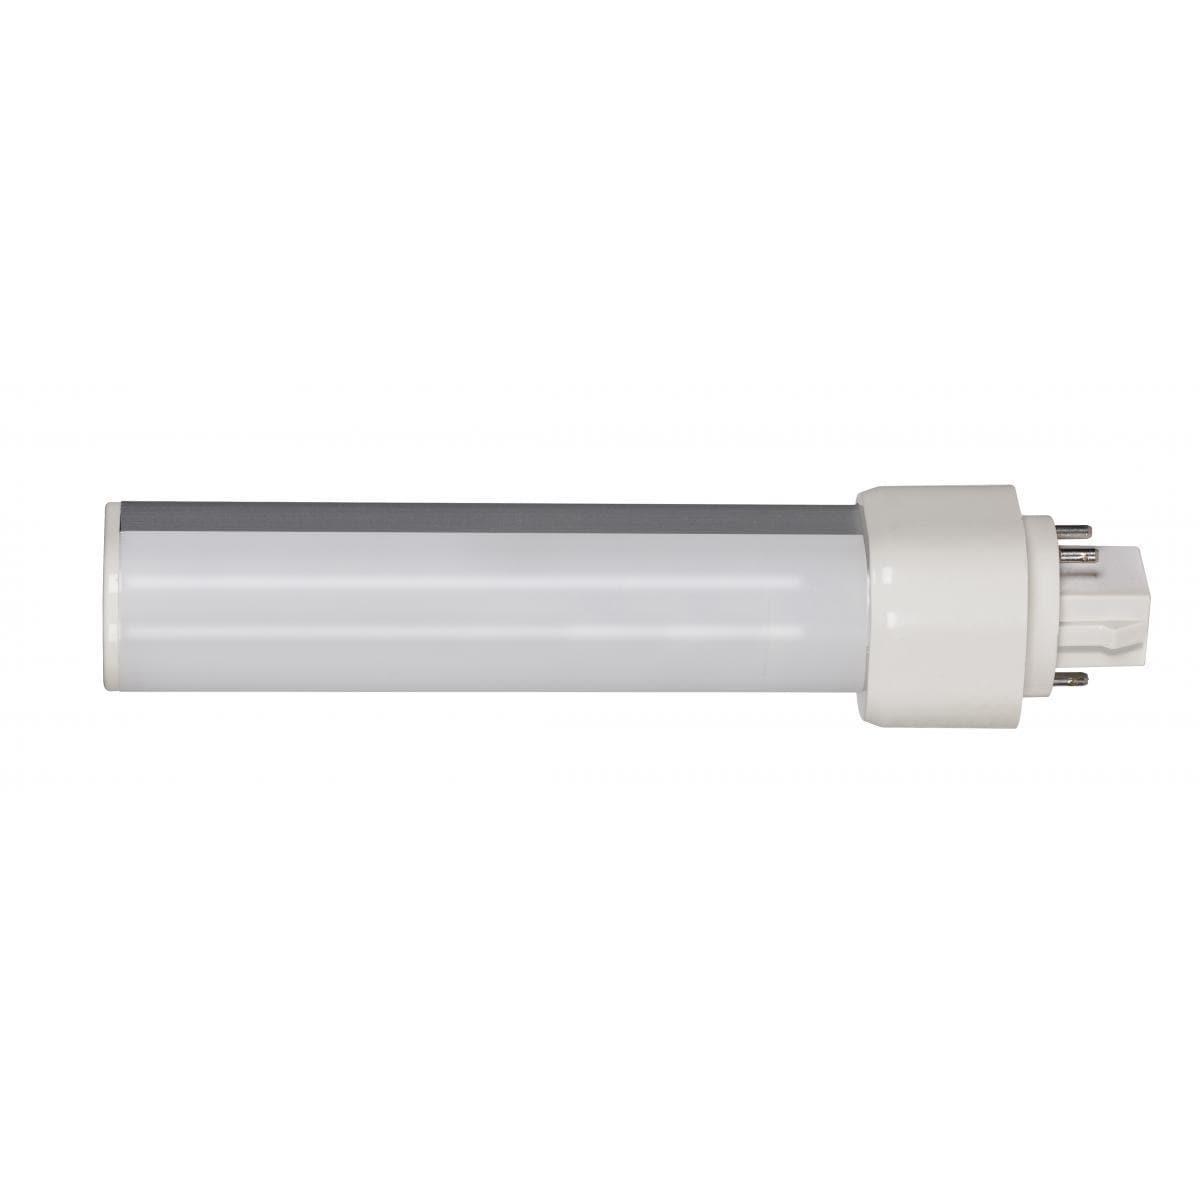 SATCO 9W LED PL 4-Pin - 5000K - G24q Base - 120 Deg. Beam...